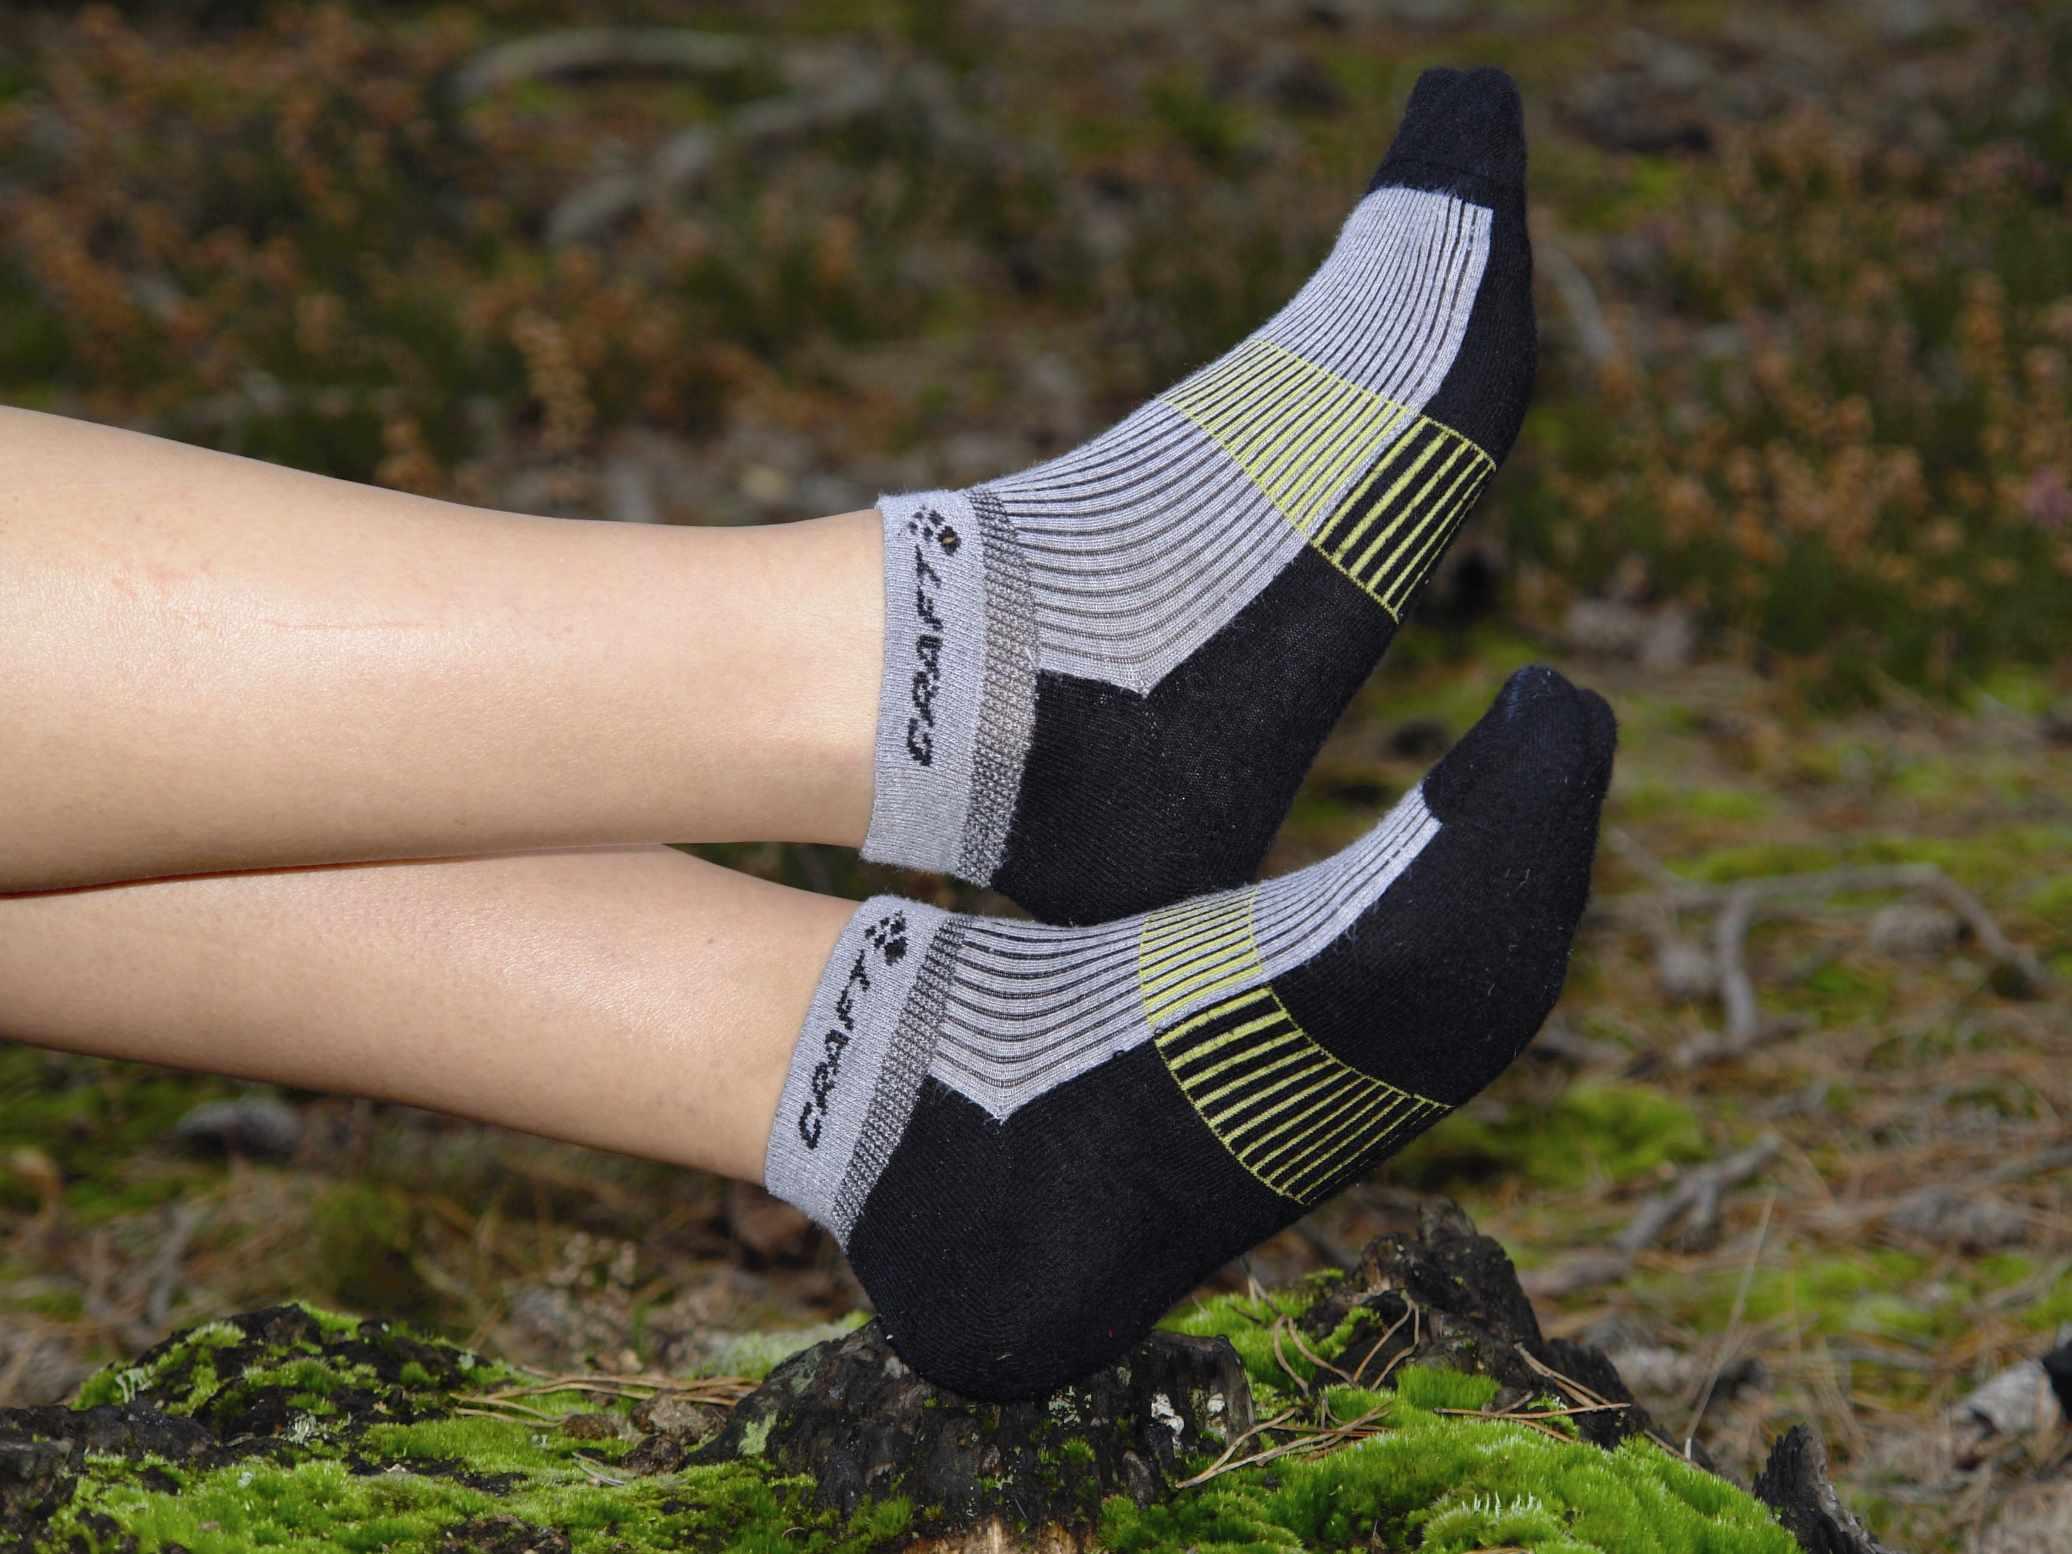 Craft Pro Warm & Pro Zero Socks